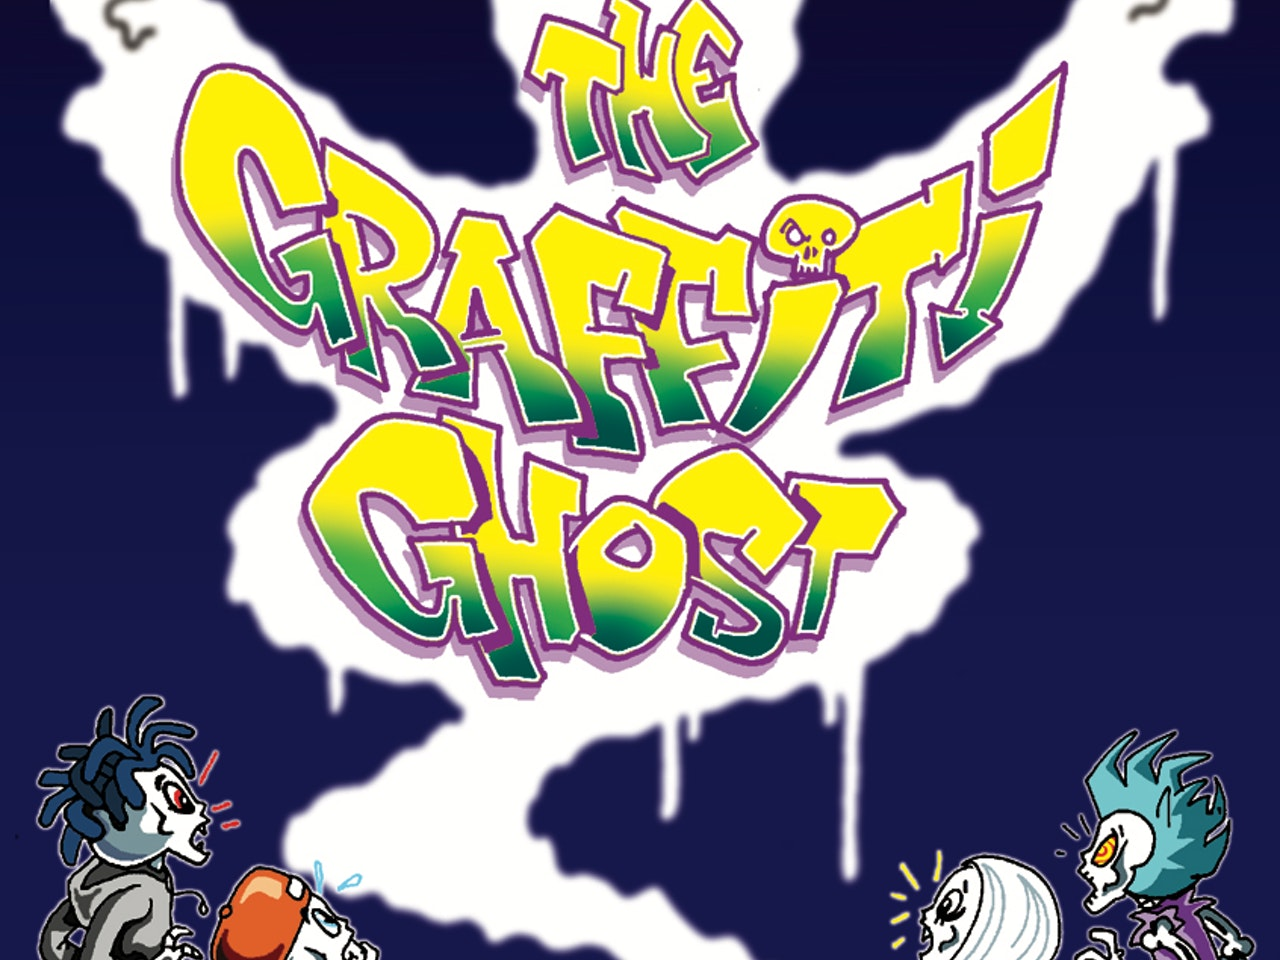 skateboarding skeletons horror halloween mystery halfpipe haunted ghoul funny Funky Happy graffiti mystery horror manga anime childrens cartoon comic strip Book cover illustration animation